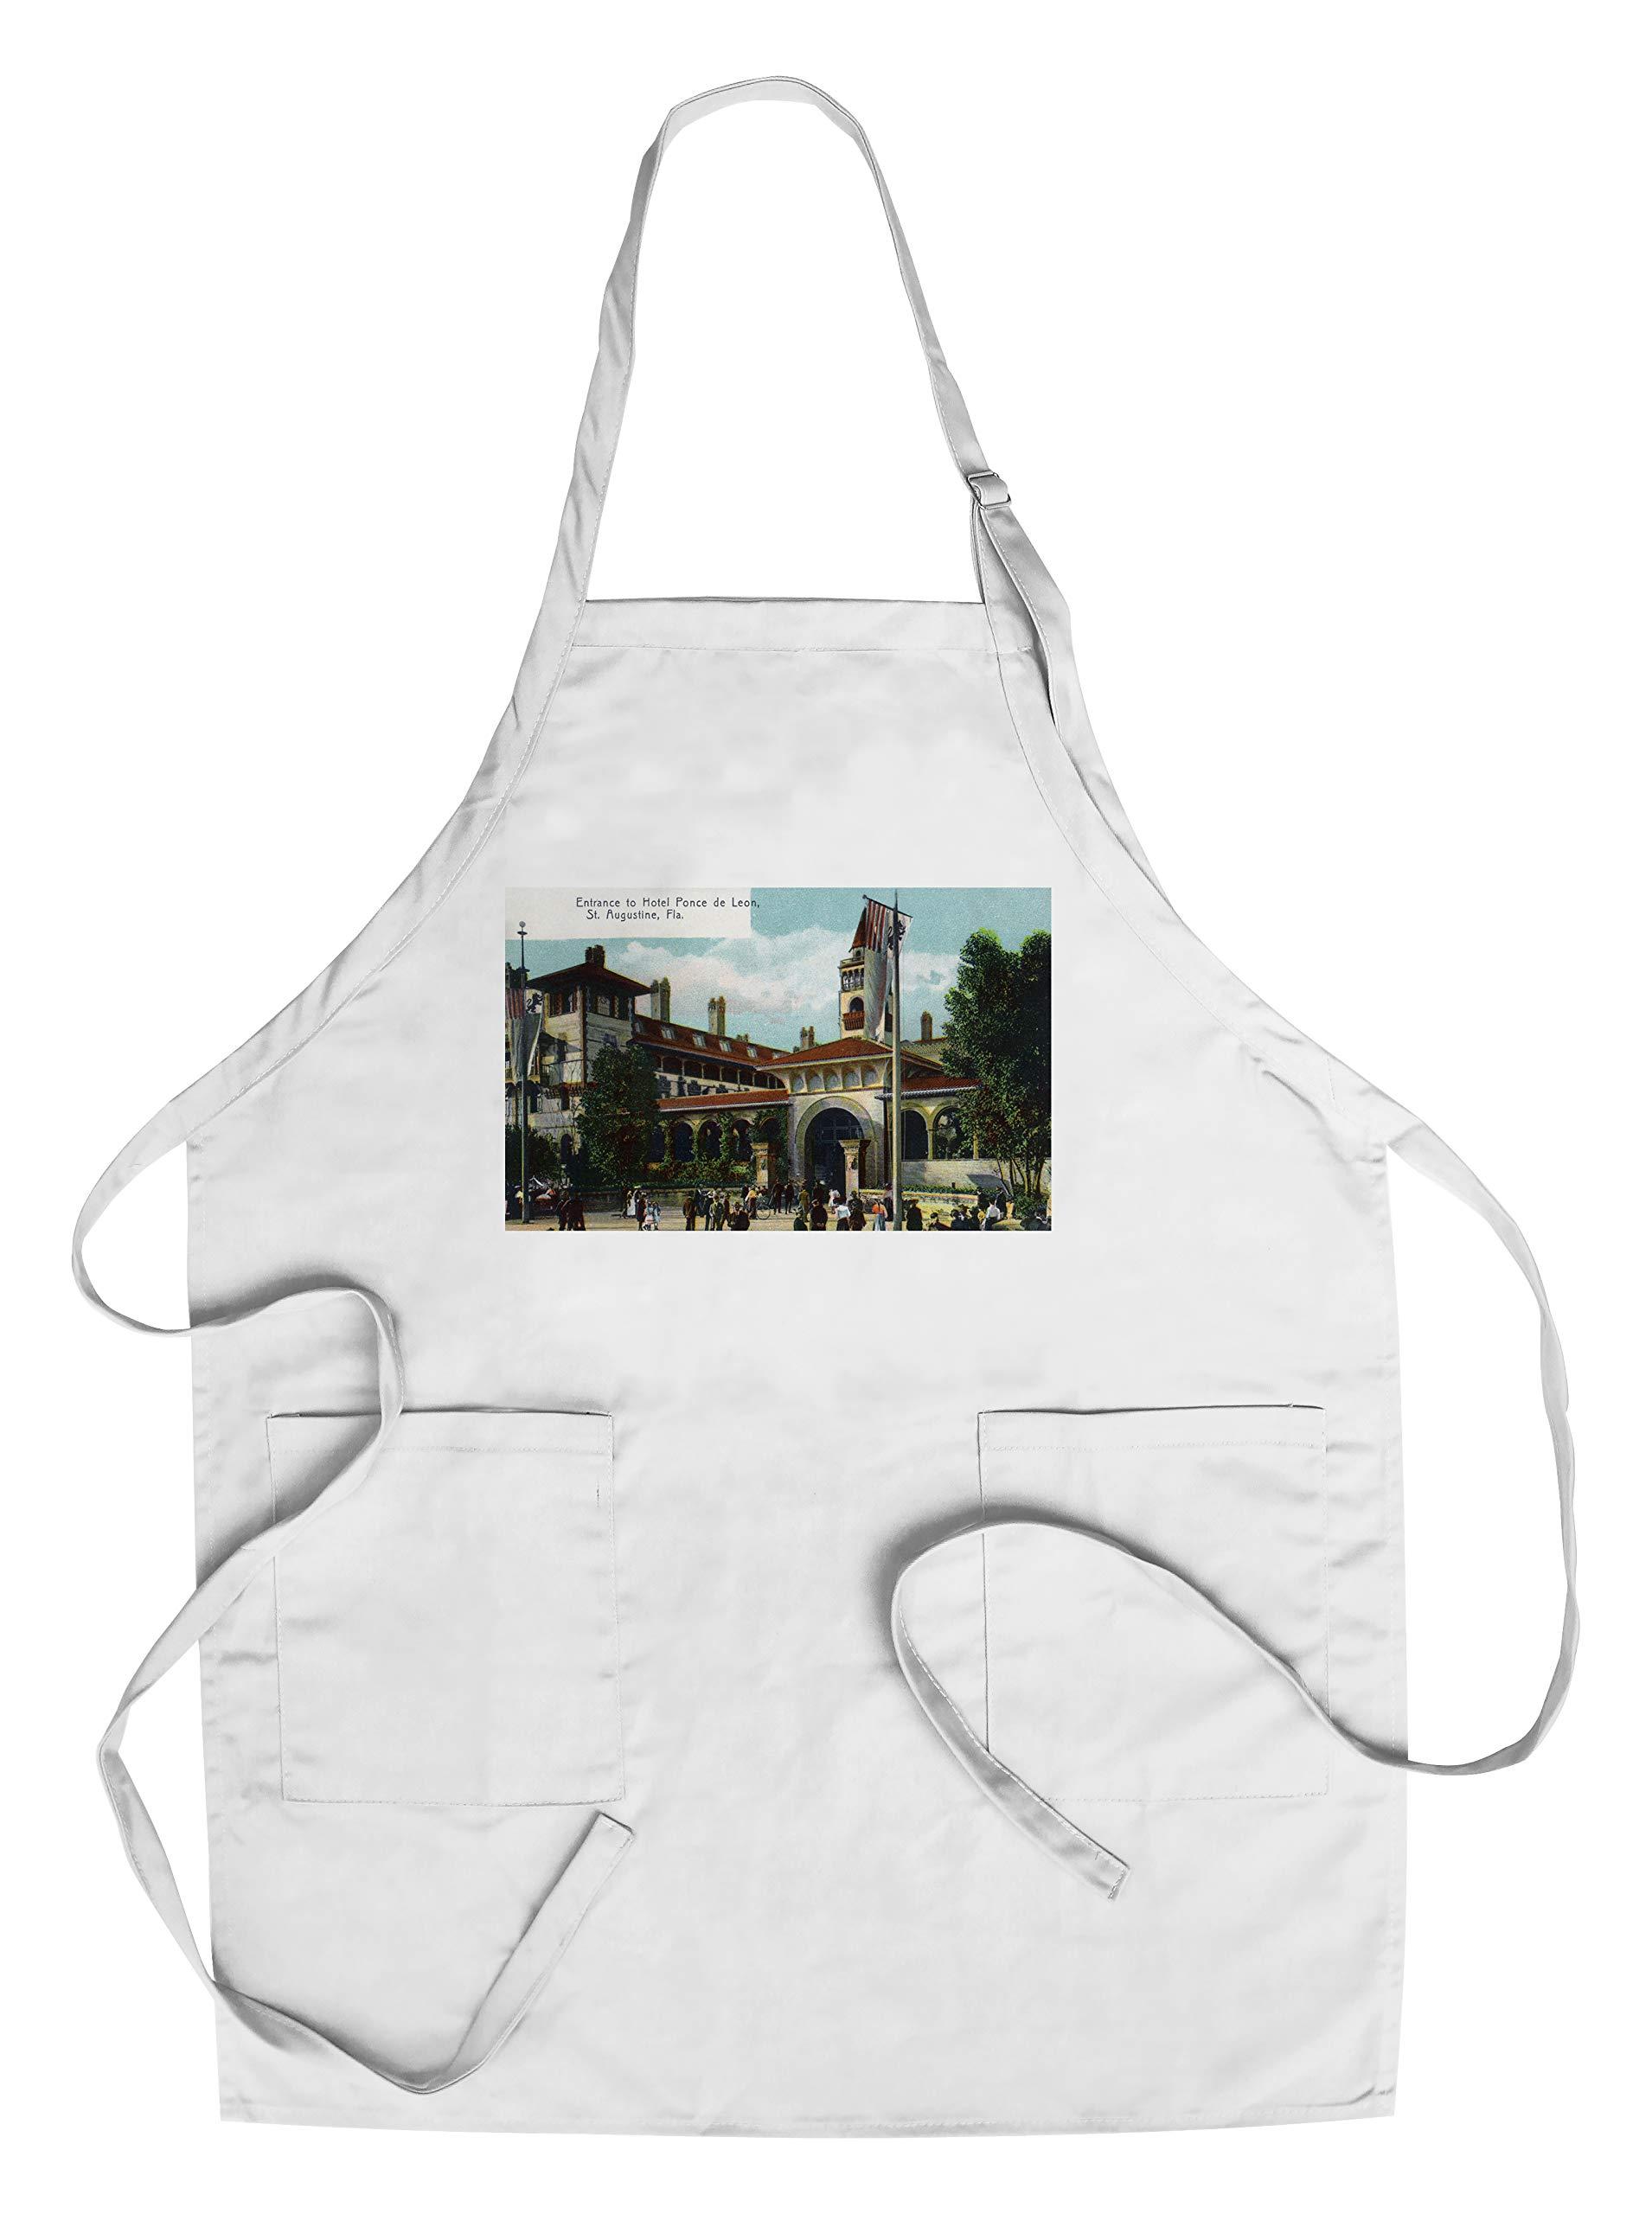 St. Augustine, Florida - Hotel Ponce de Leon Entrance Scene (Cotton/Polyester Chef's Apron)